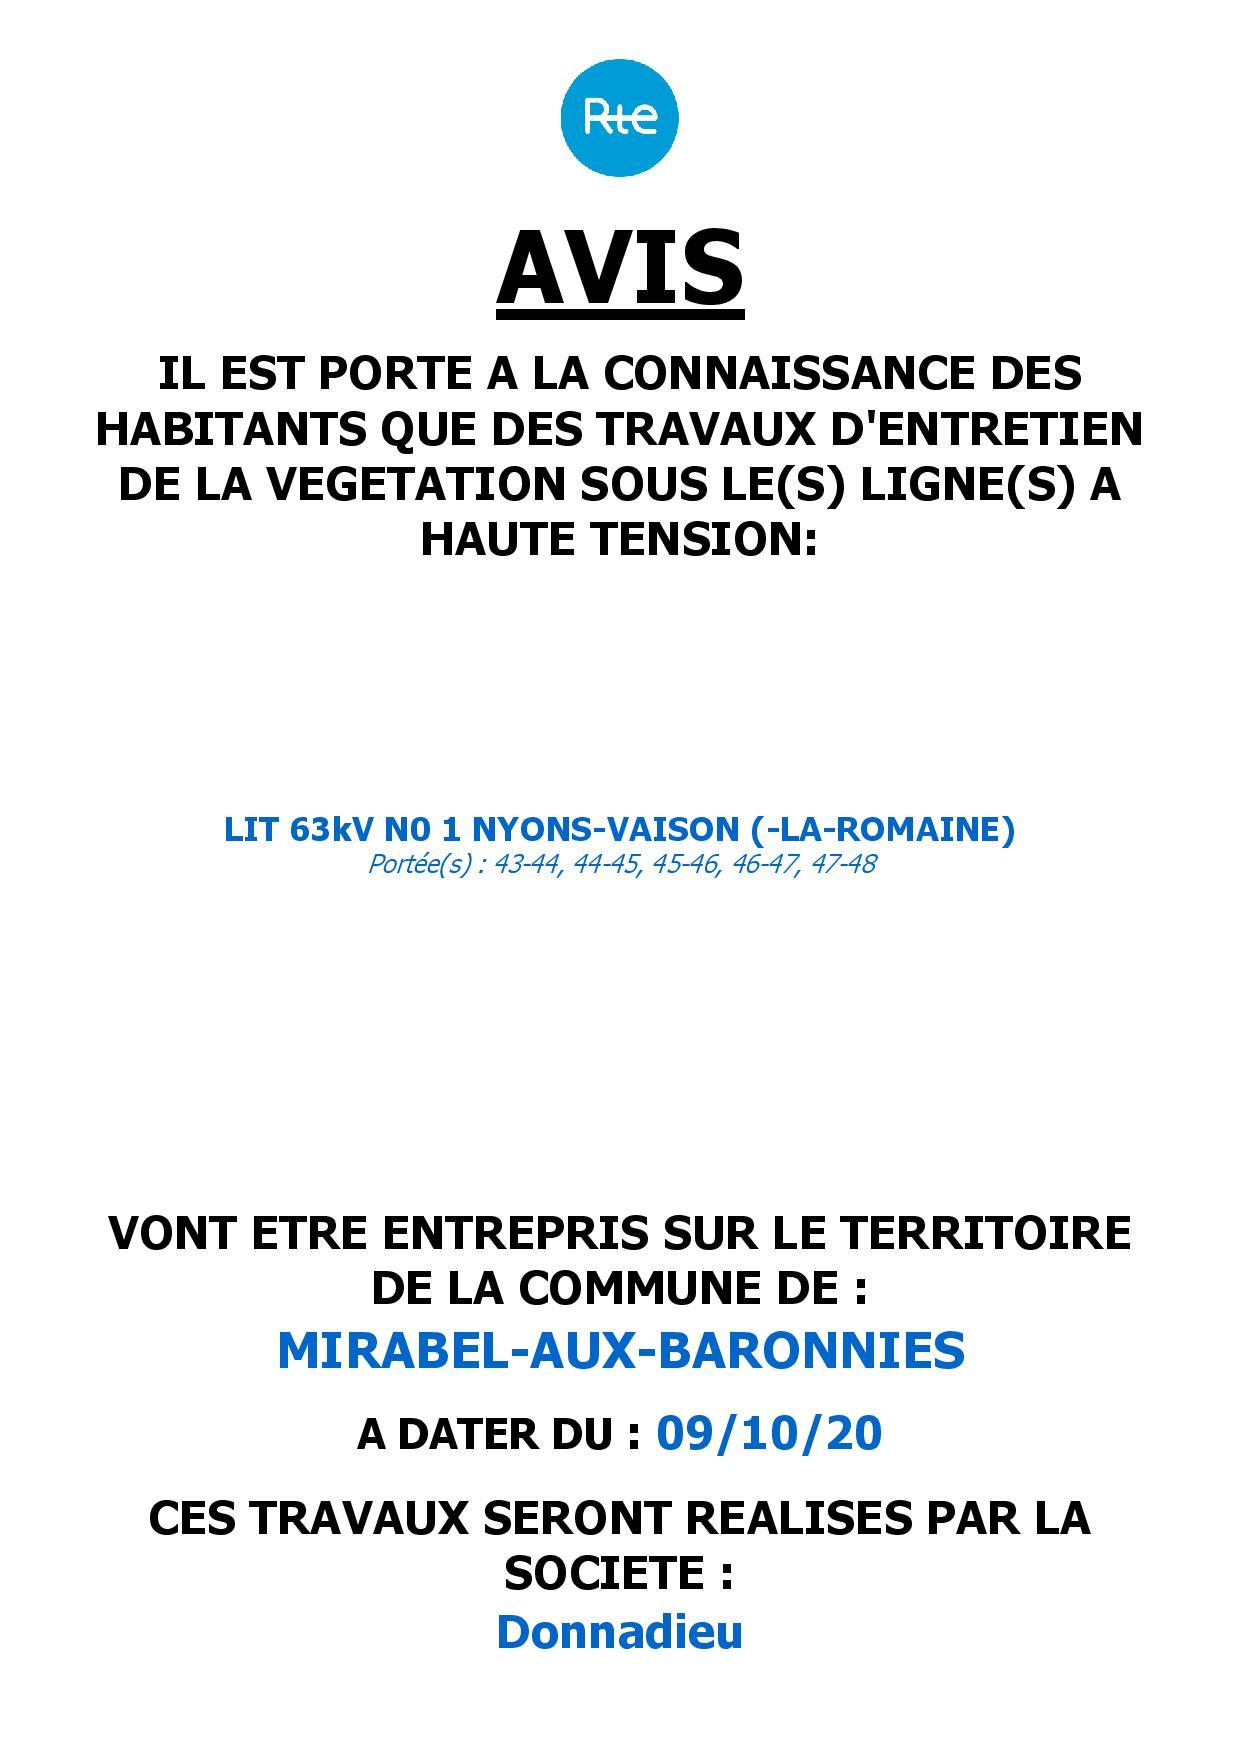 Affiche MIRABEL AUX BARONNIES R CEV 3 VAISON NYONS 29 09 20 page 001